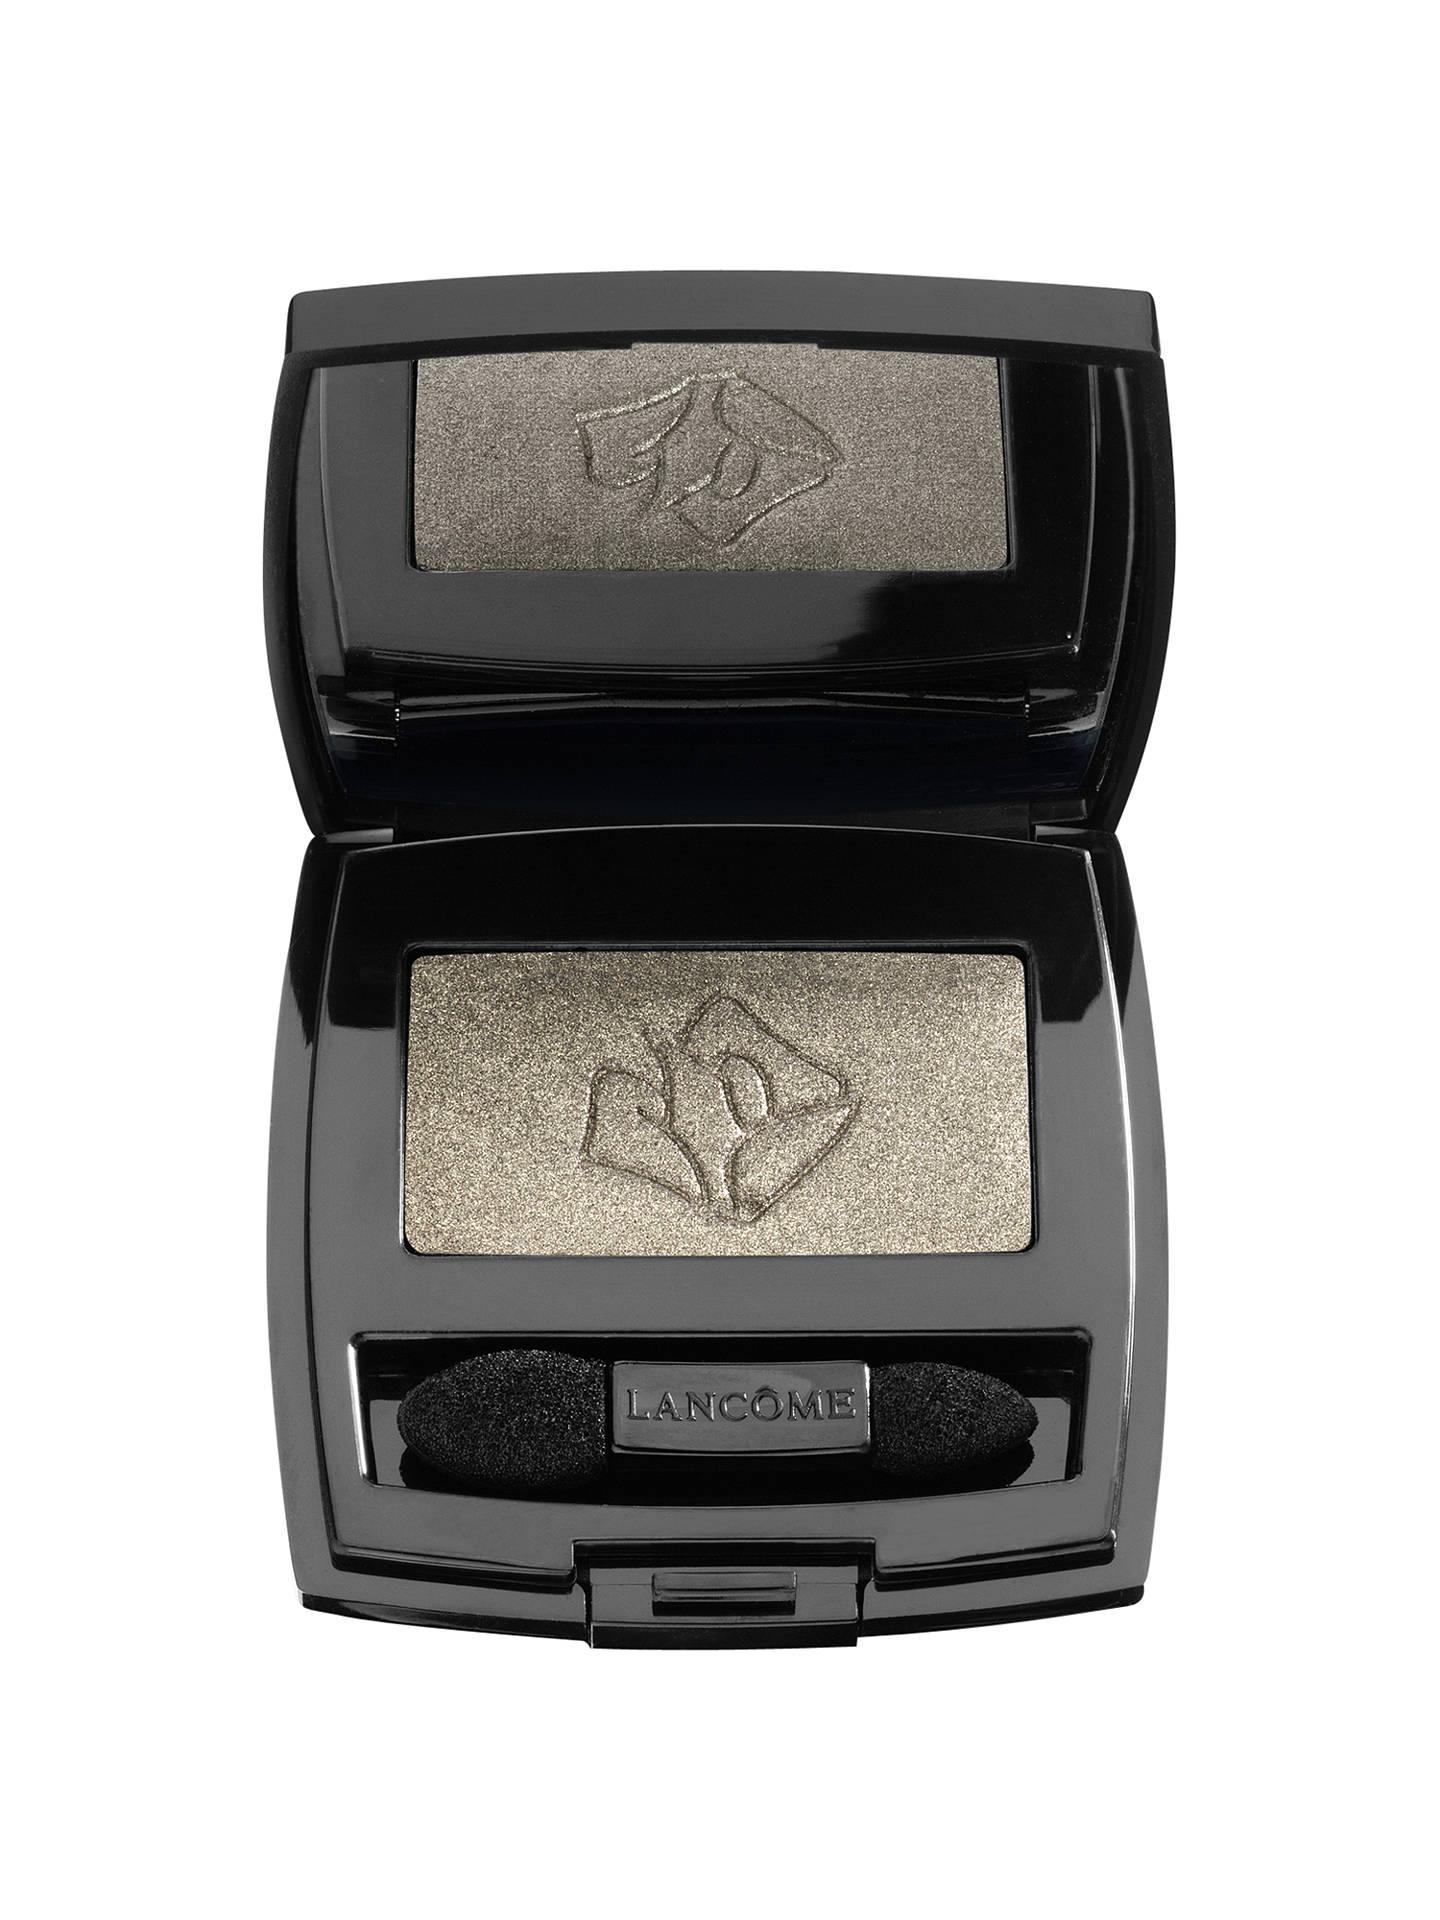 49c75c516d6 Buy Lancôme Ombre Hypnôse Eyeshadow - Iridescent, I204 Cuban Light Online  at johnlewis.com ...